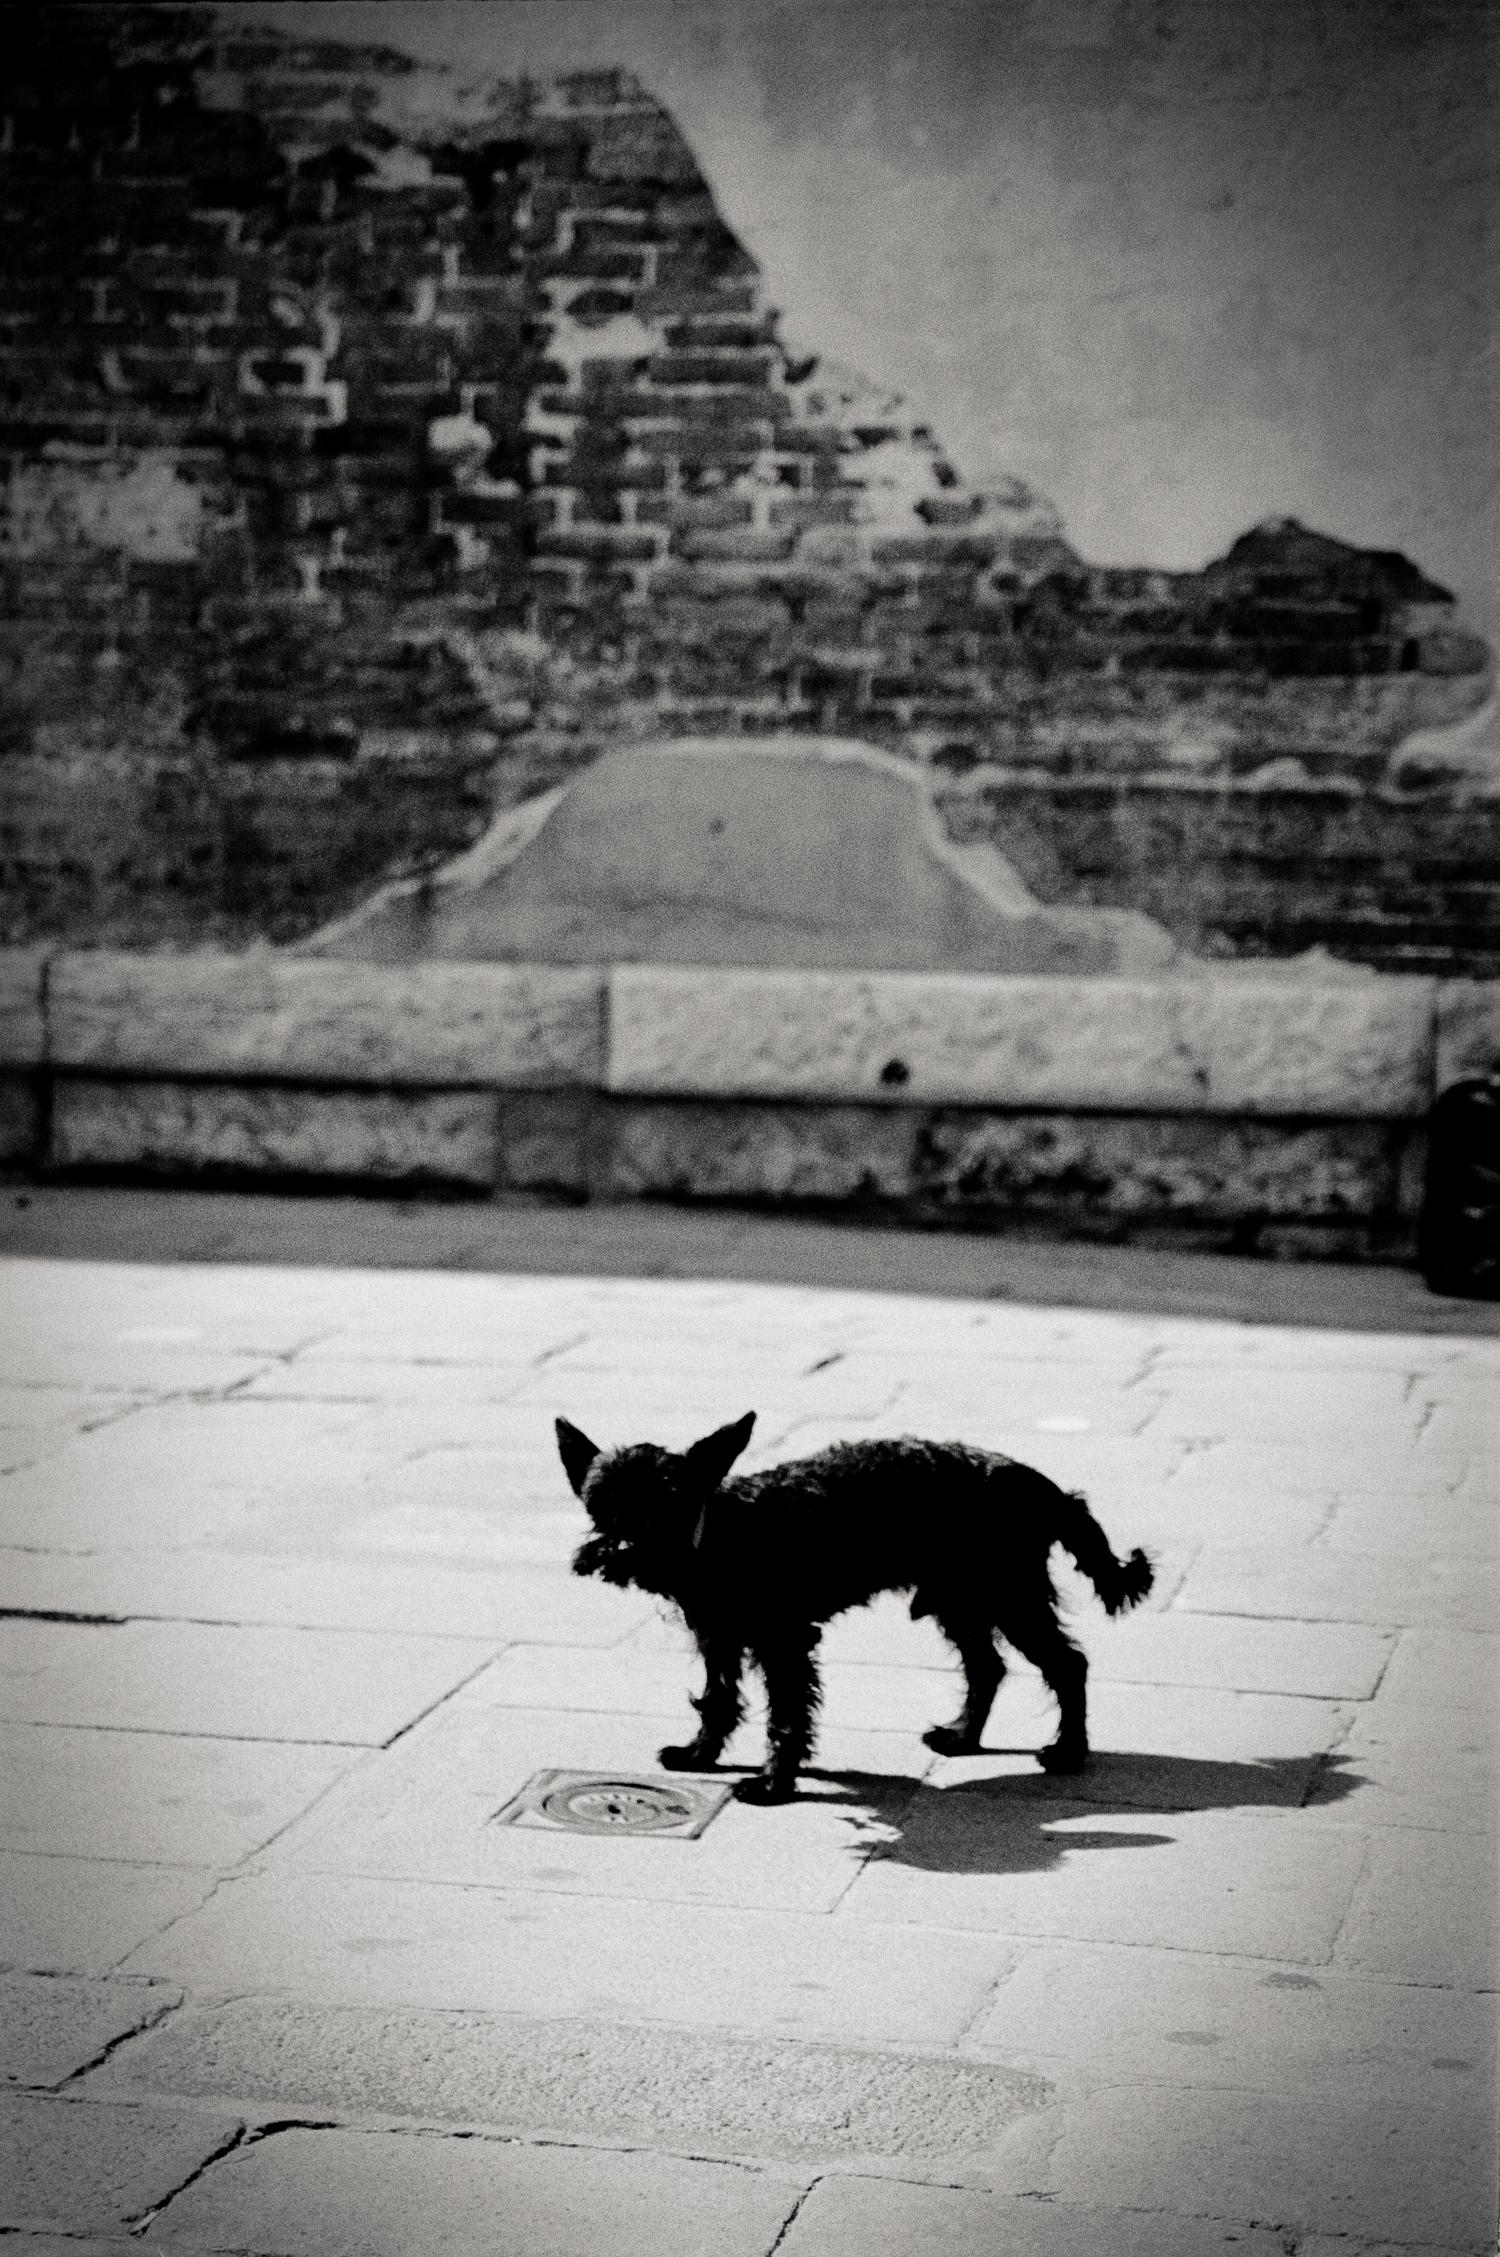 local dog, Venice, Italy 2001.